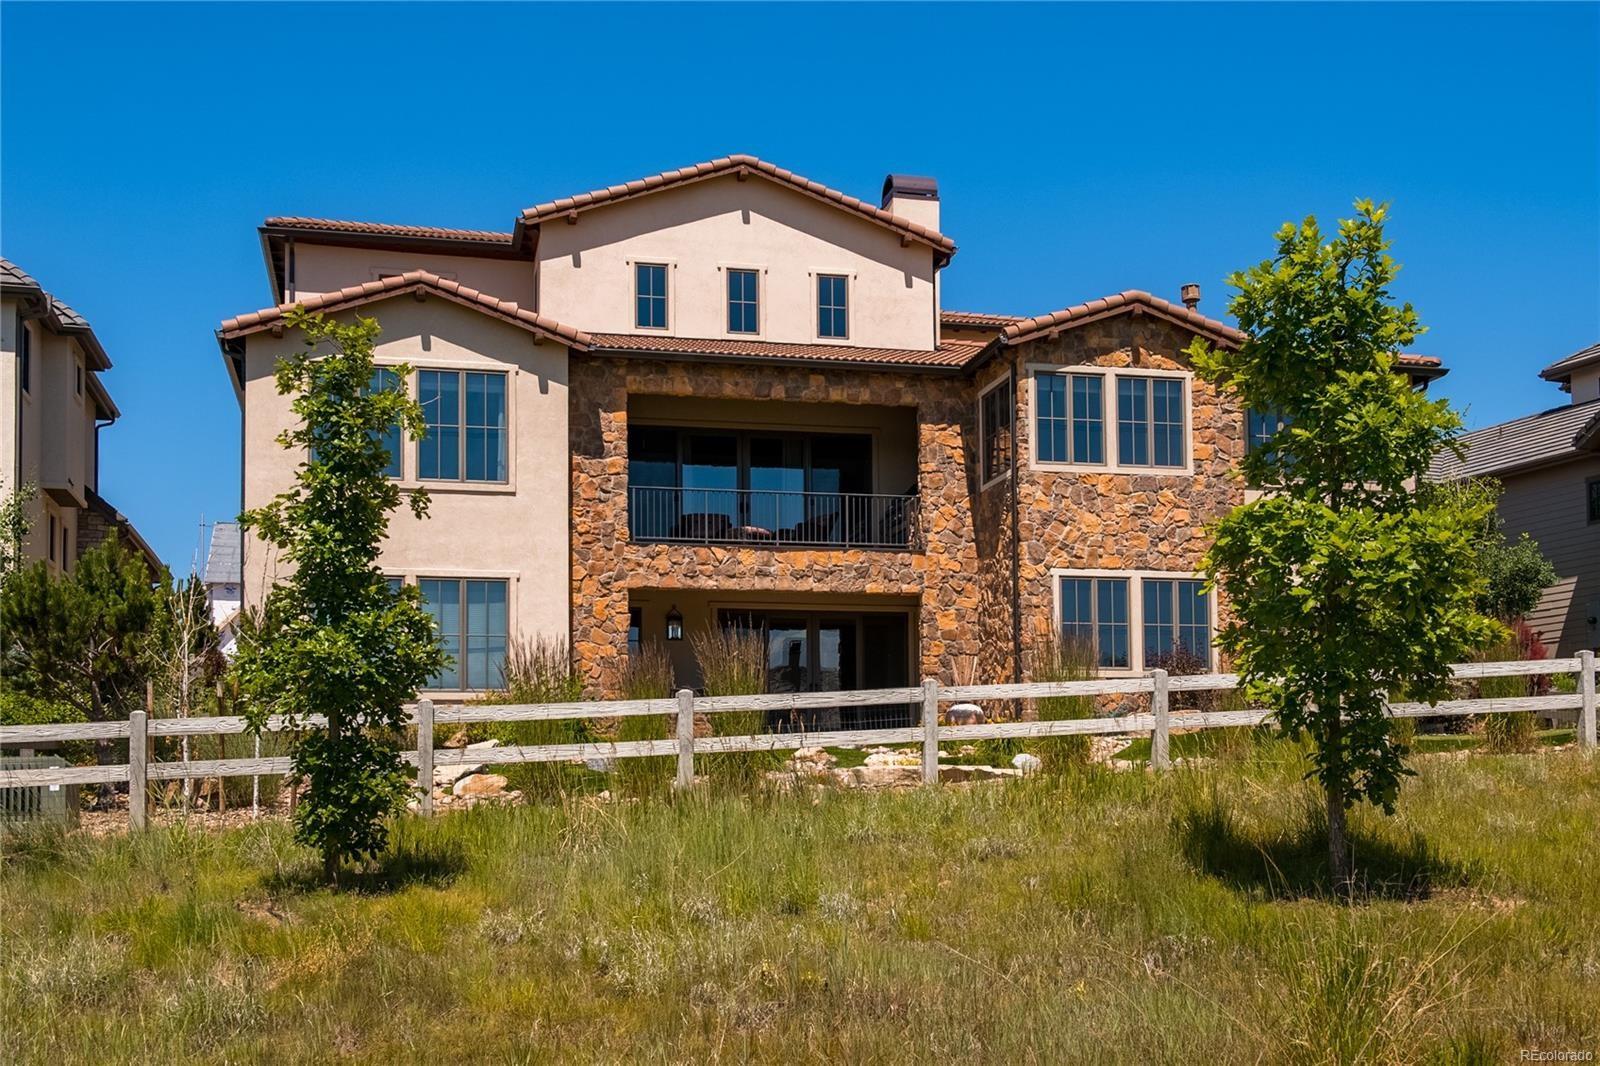 MLS# 8045685 - 39 - 40 Flowerburst Way, Highlands Ranch, CO 80126